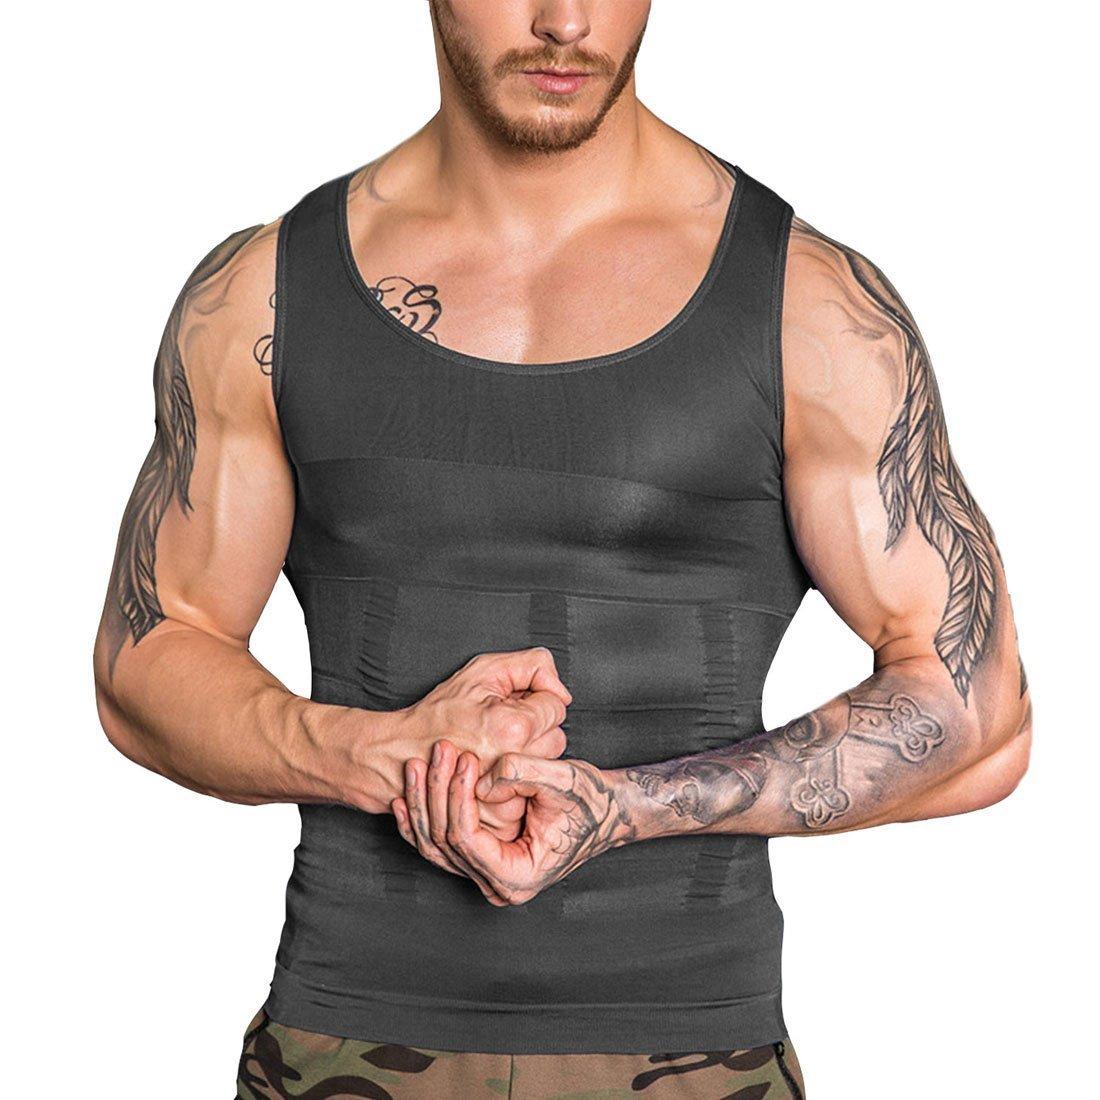 SAILORSTAR Men Compression Shirt Gynecomastia Body Shaper Vest for Slimming Chest Stomach (Black1, Large/38.2-42.1 inch Waist)